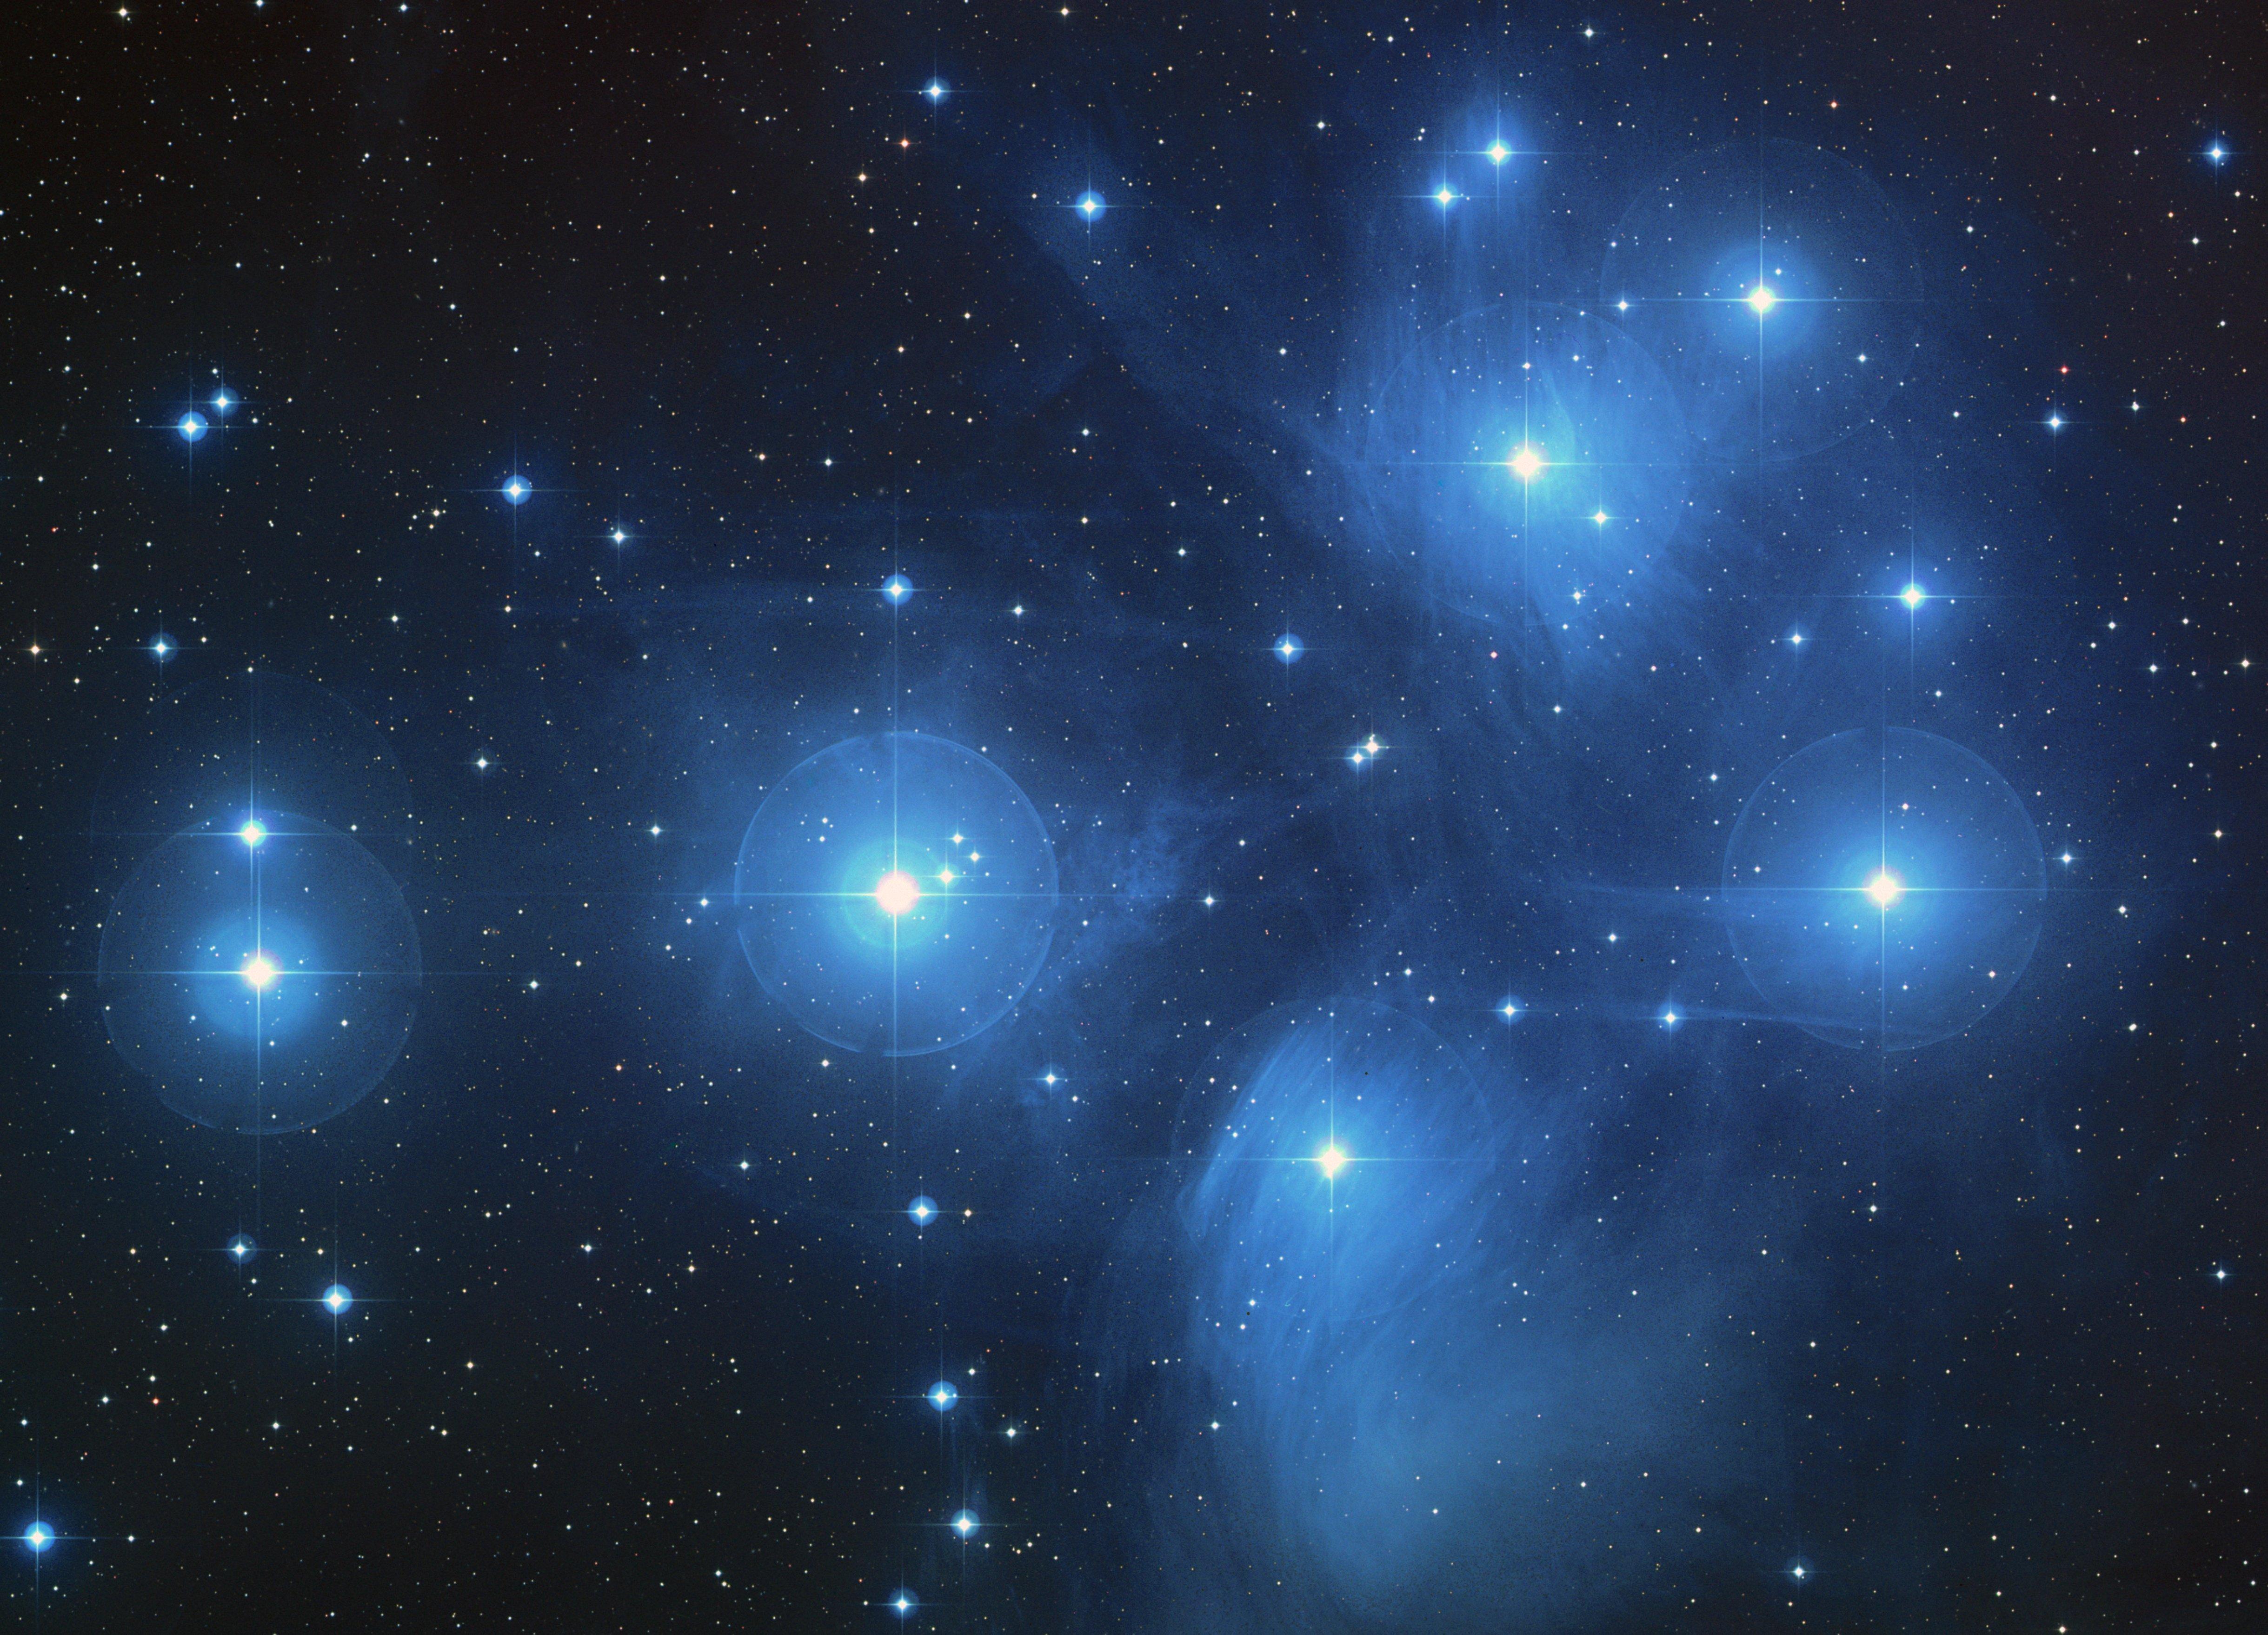 無料画像 天の川 雰囲気 スペース 星雲 宇宙空間 天文学 図